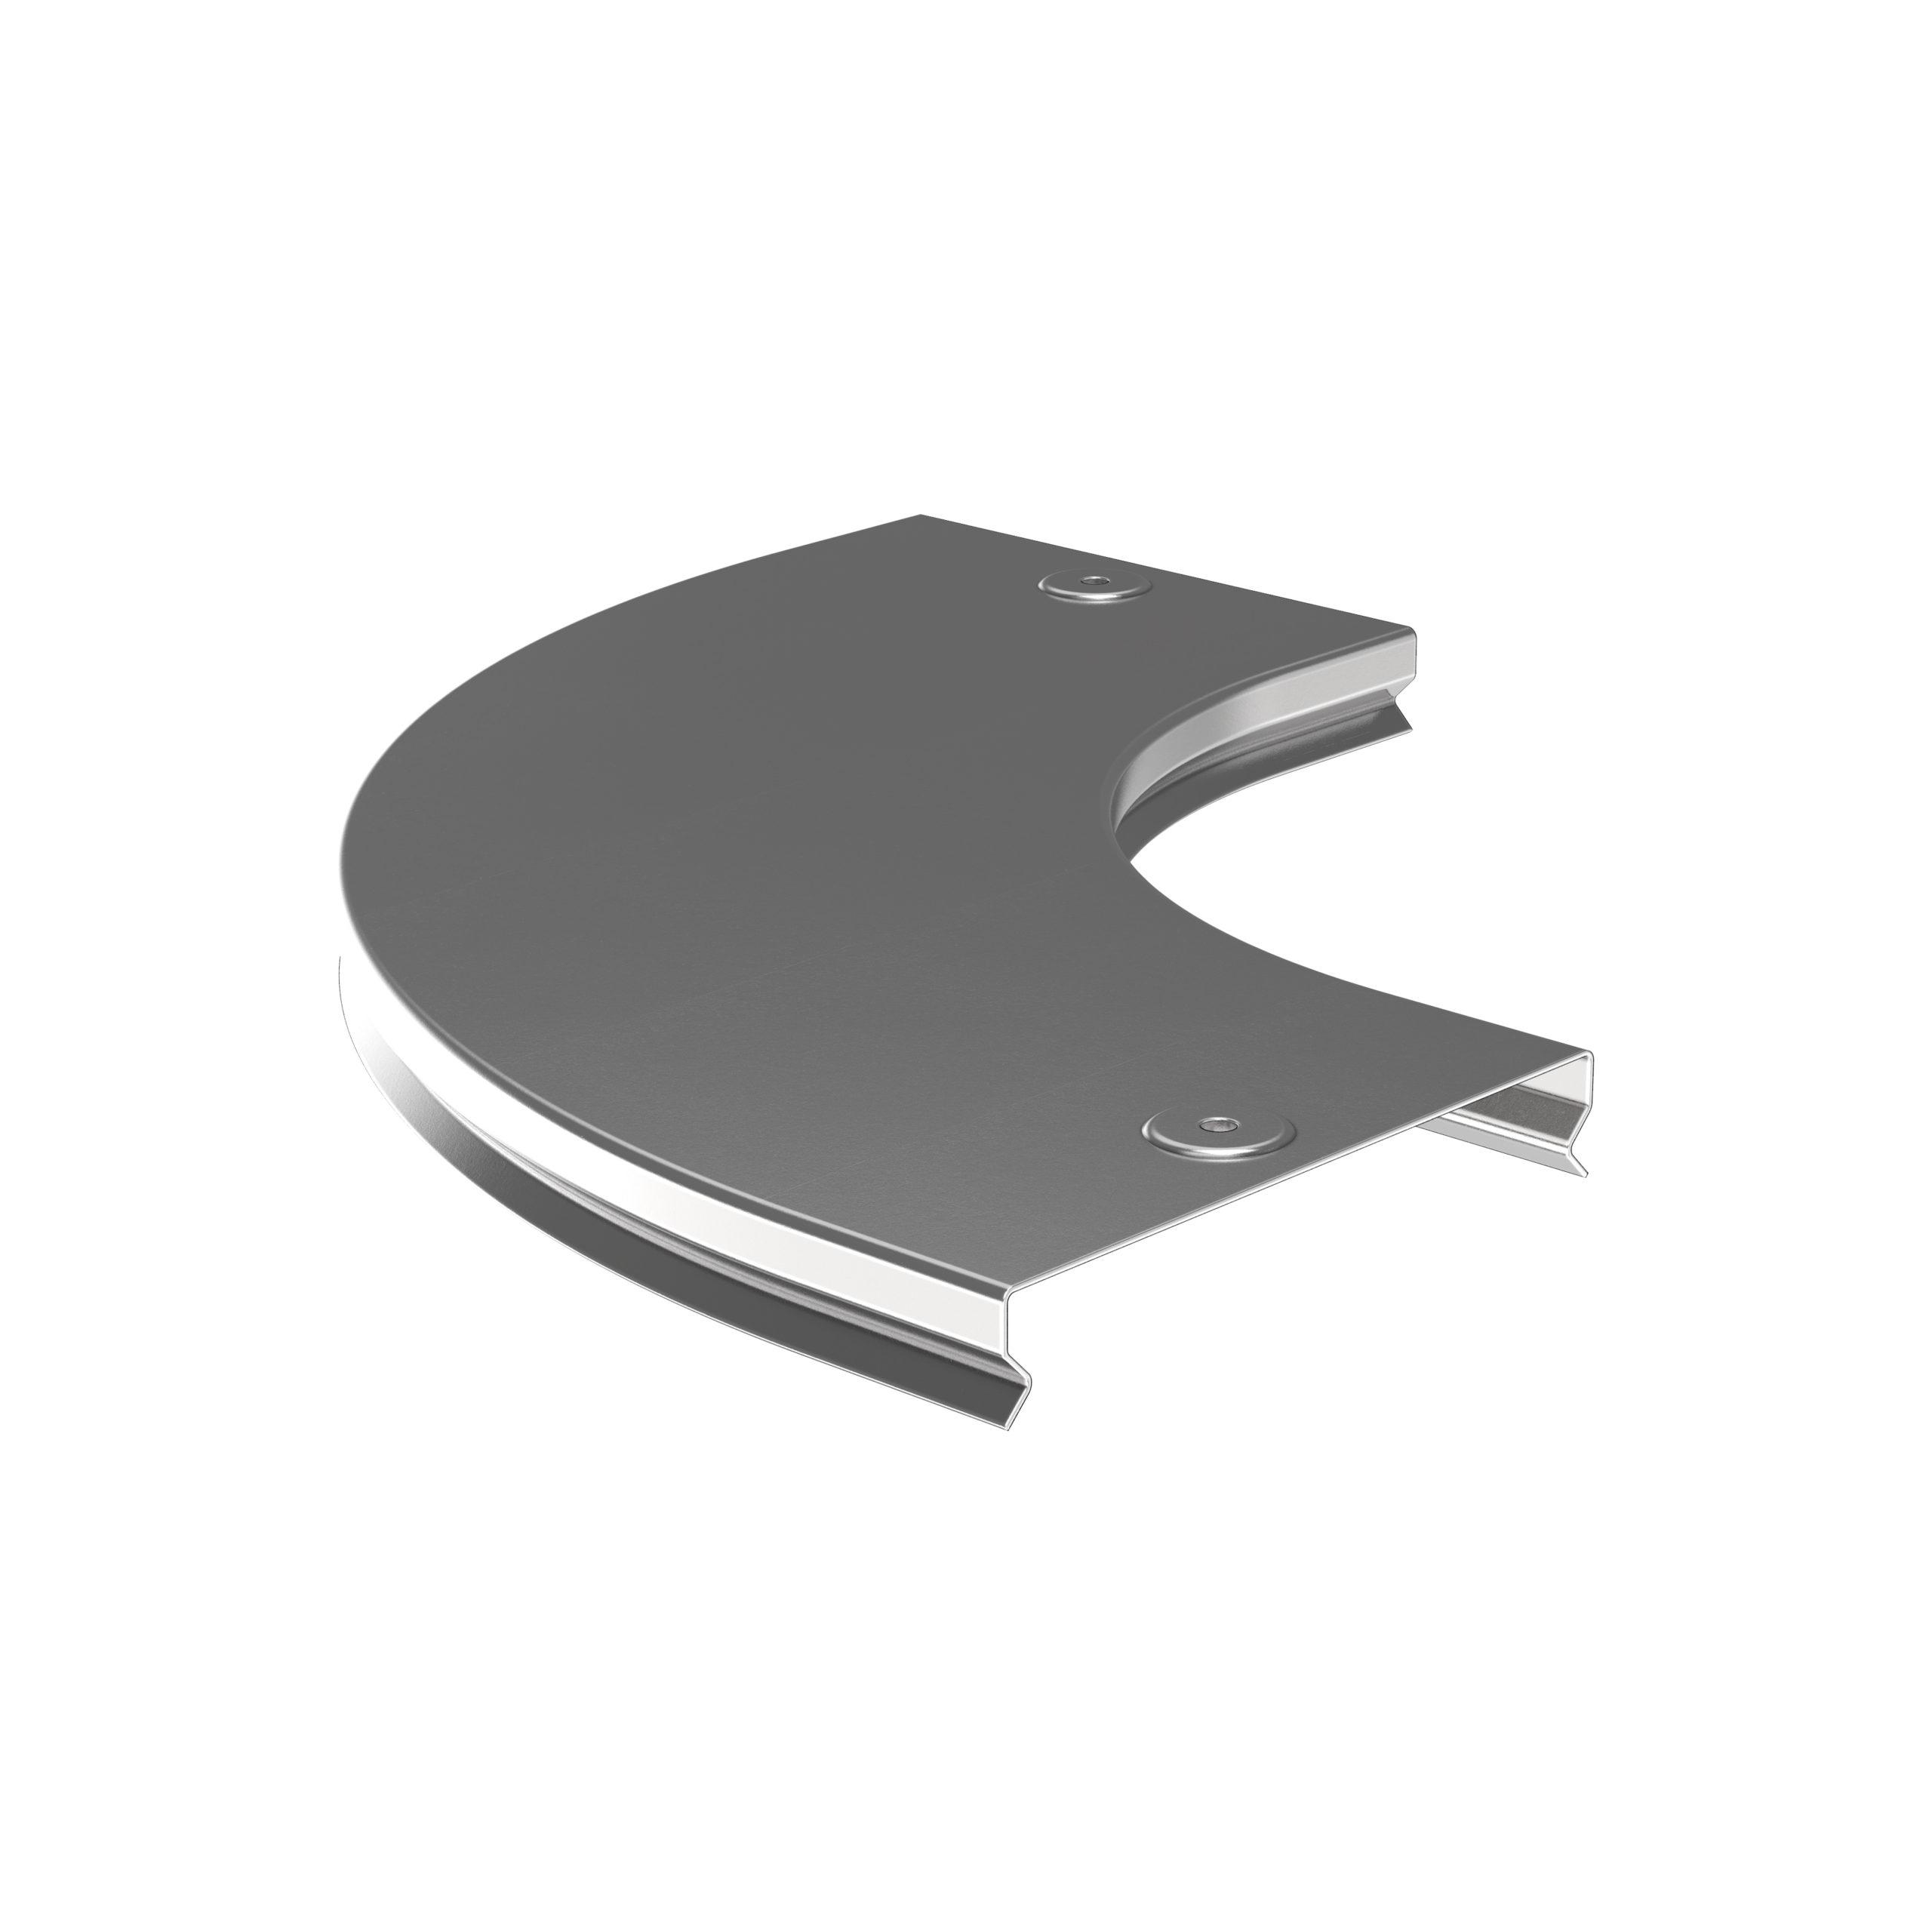 Крышка поворота плавного 90град (тип Г01) ESCA 500мм IEK